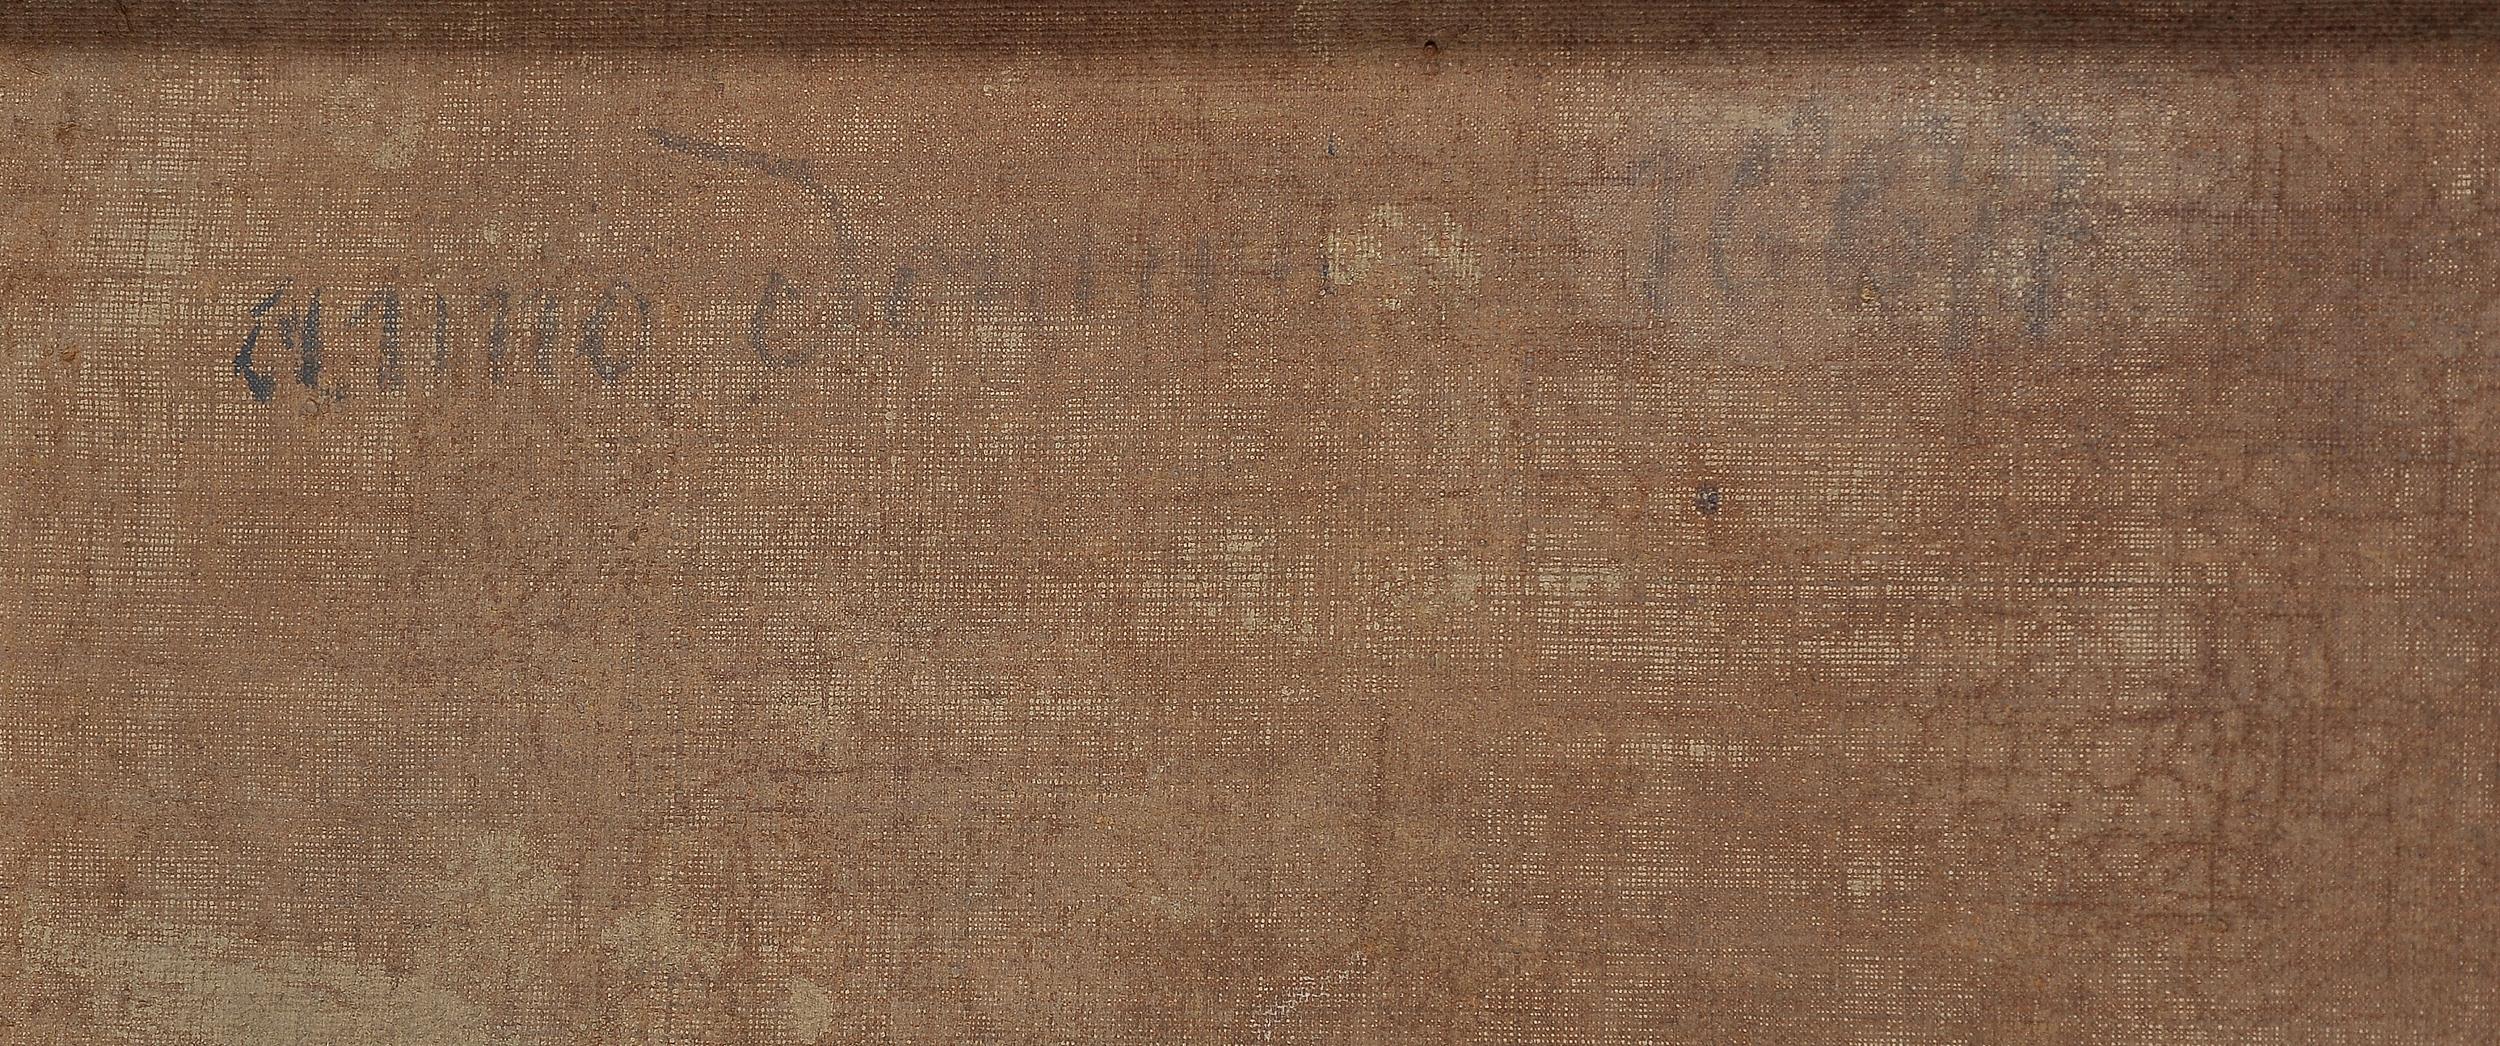 Bartolomeo Esteban Murillo, Sevilla 1617 – 1682 Sevilla (Nachfolge), 17./18. Jhdt. - Image 8 of 9